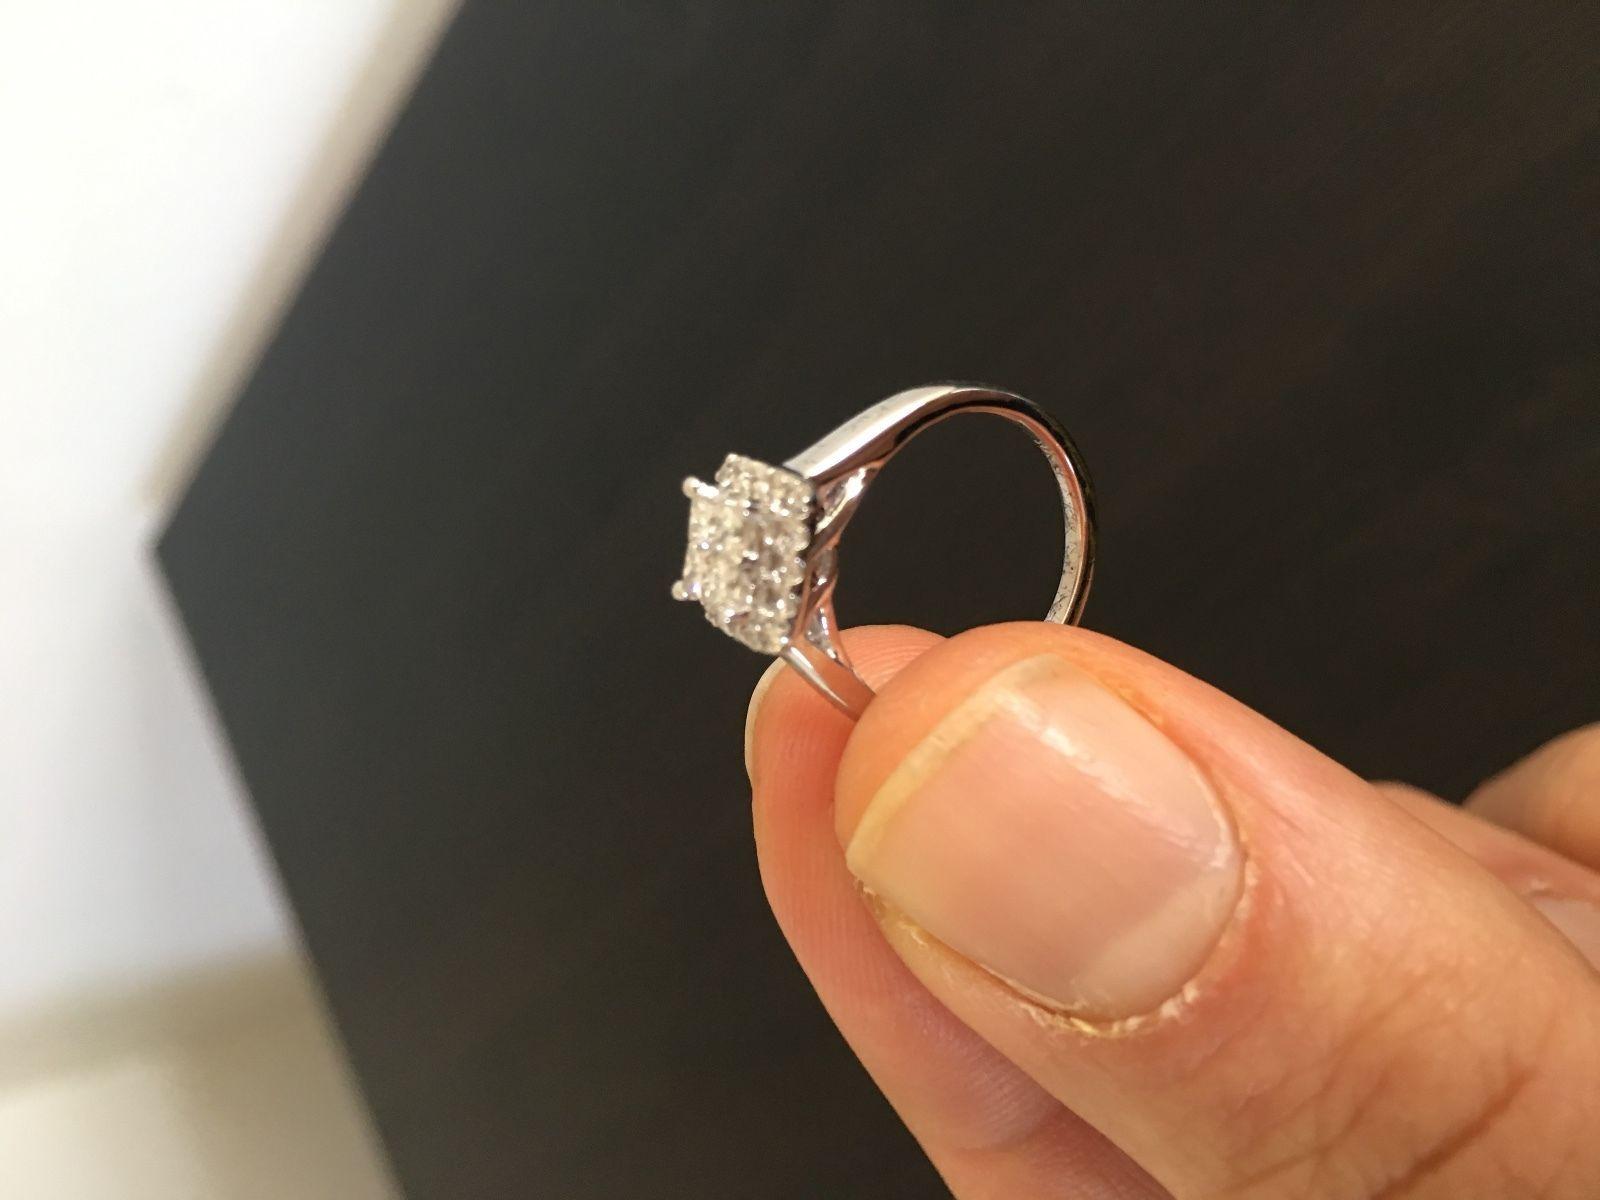 Kay Jewelers Diamond Engagement Ring 10k White Gold 4k Diamond Size 4